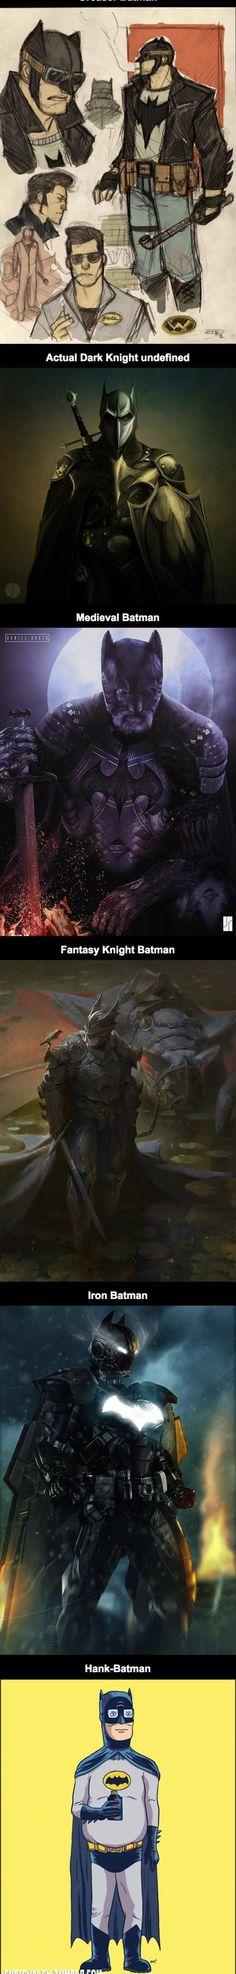 Awesome Alternate Fan Art Takes On Batman - The Meta Picture